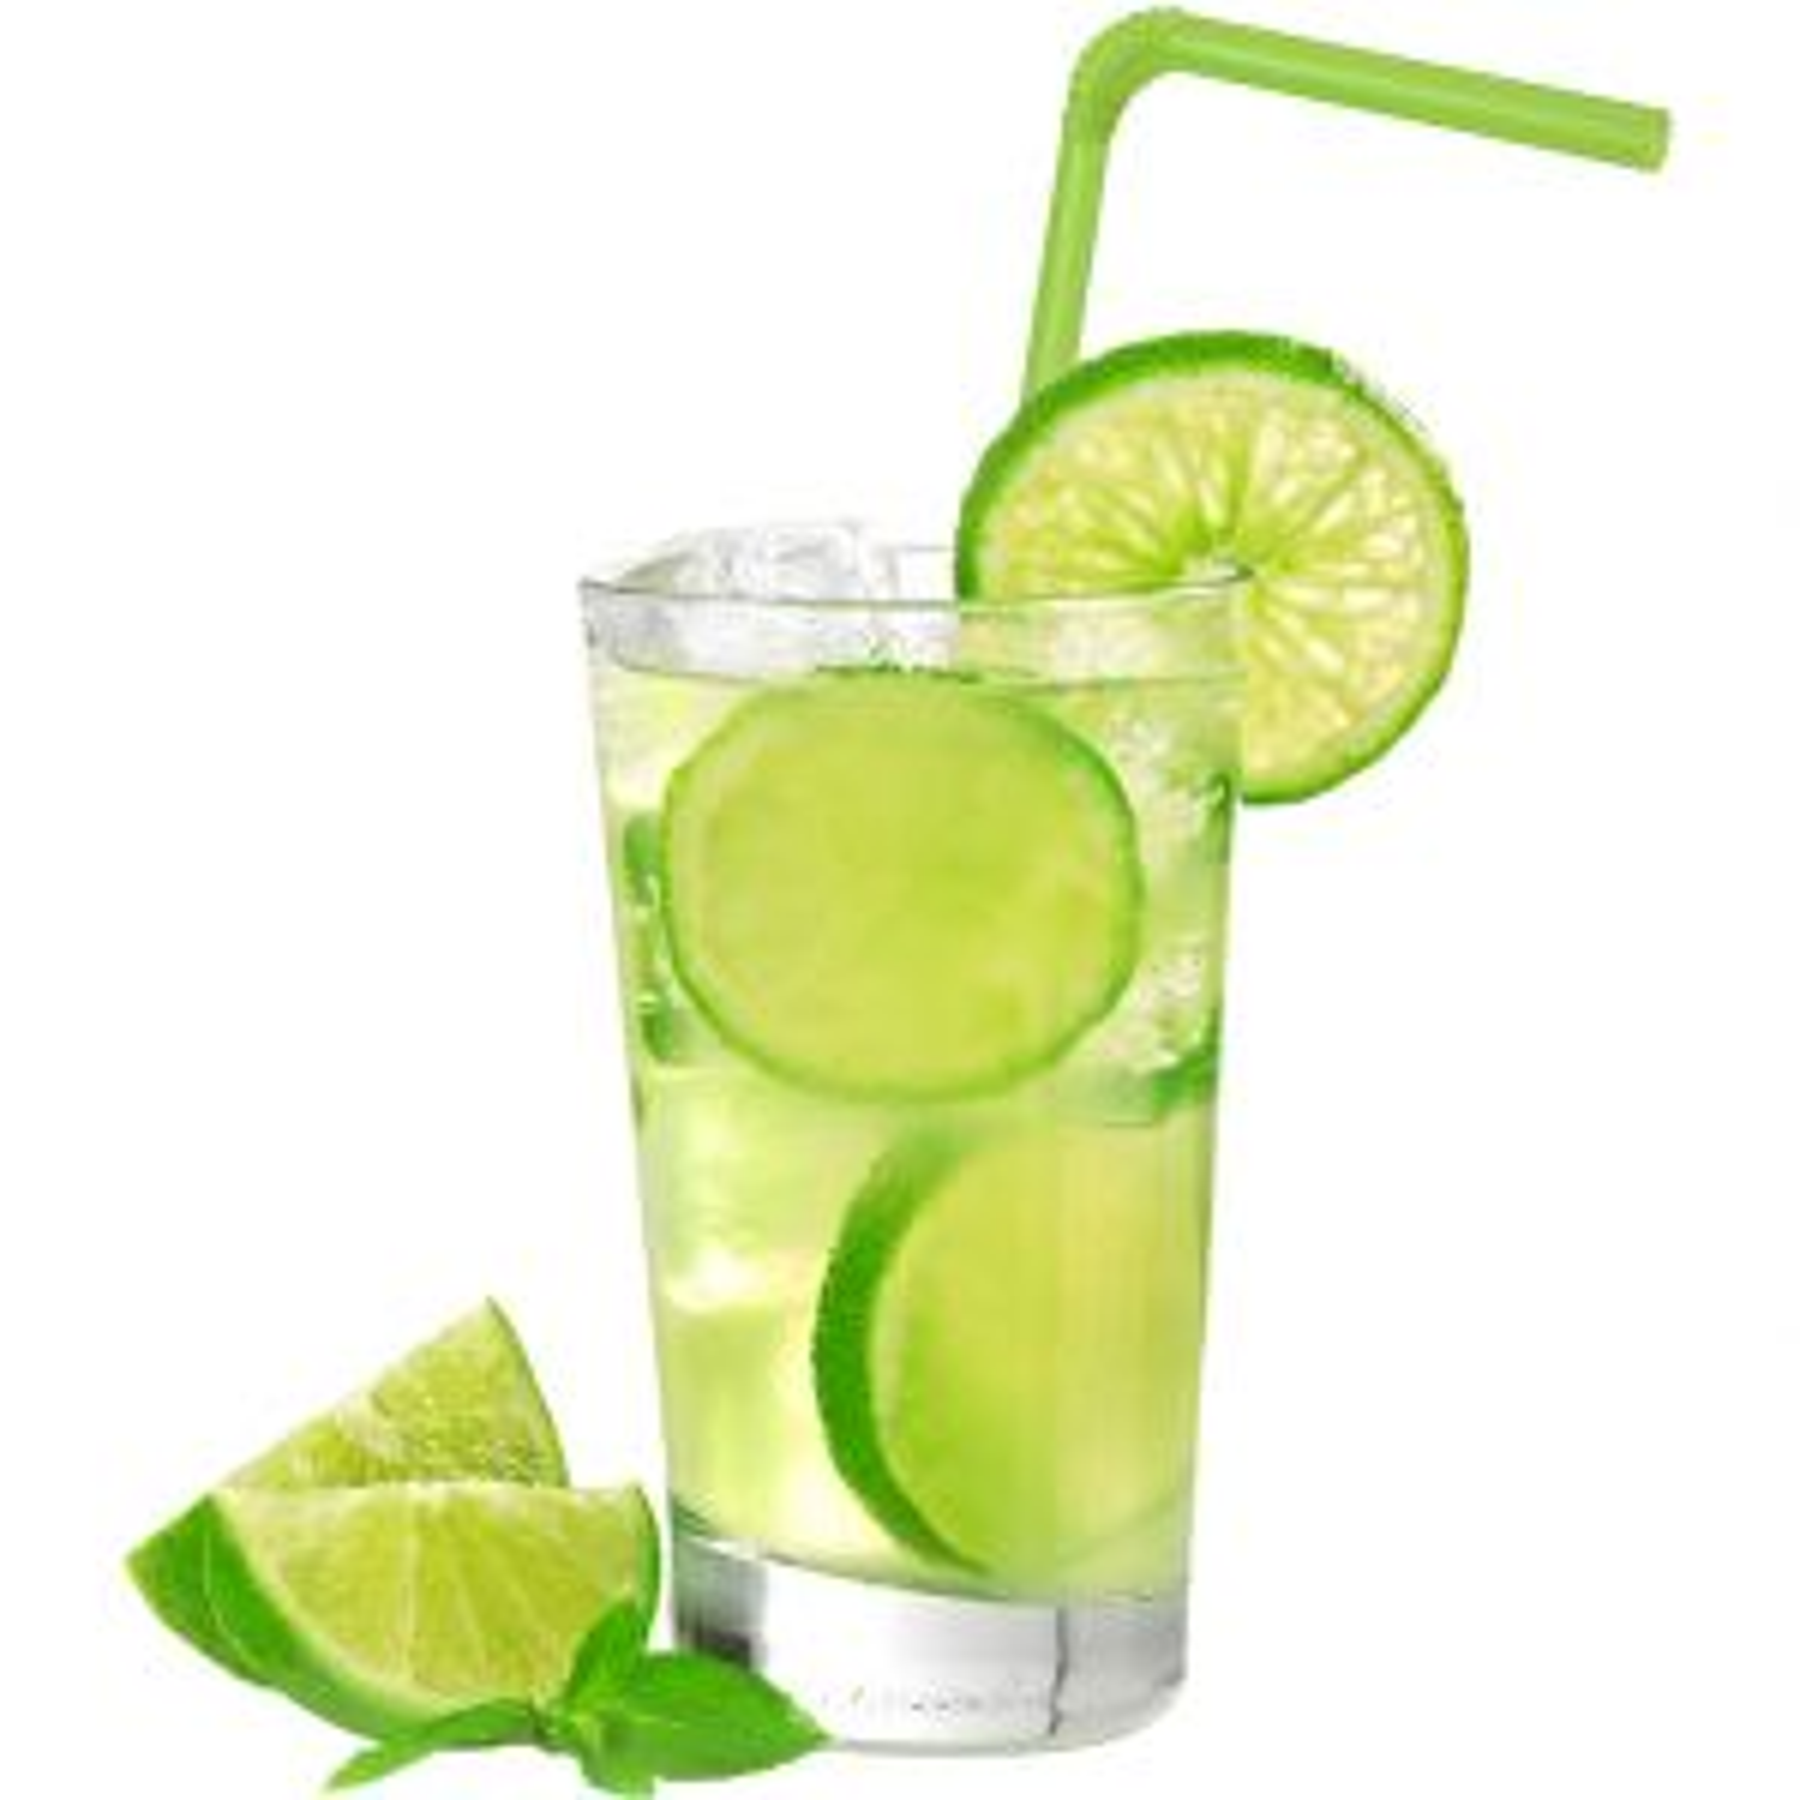 Skoddejuice Lime Cold Pressed Aroma